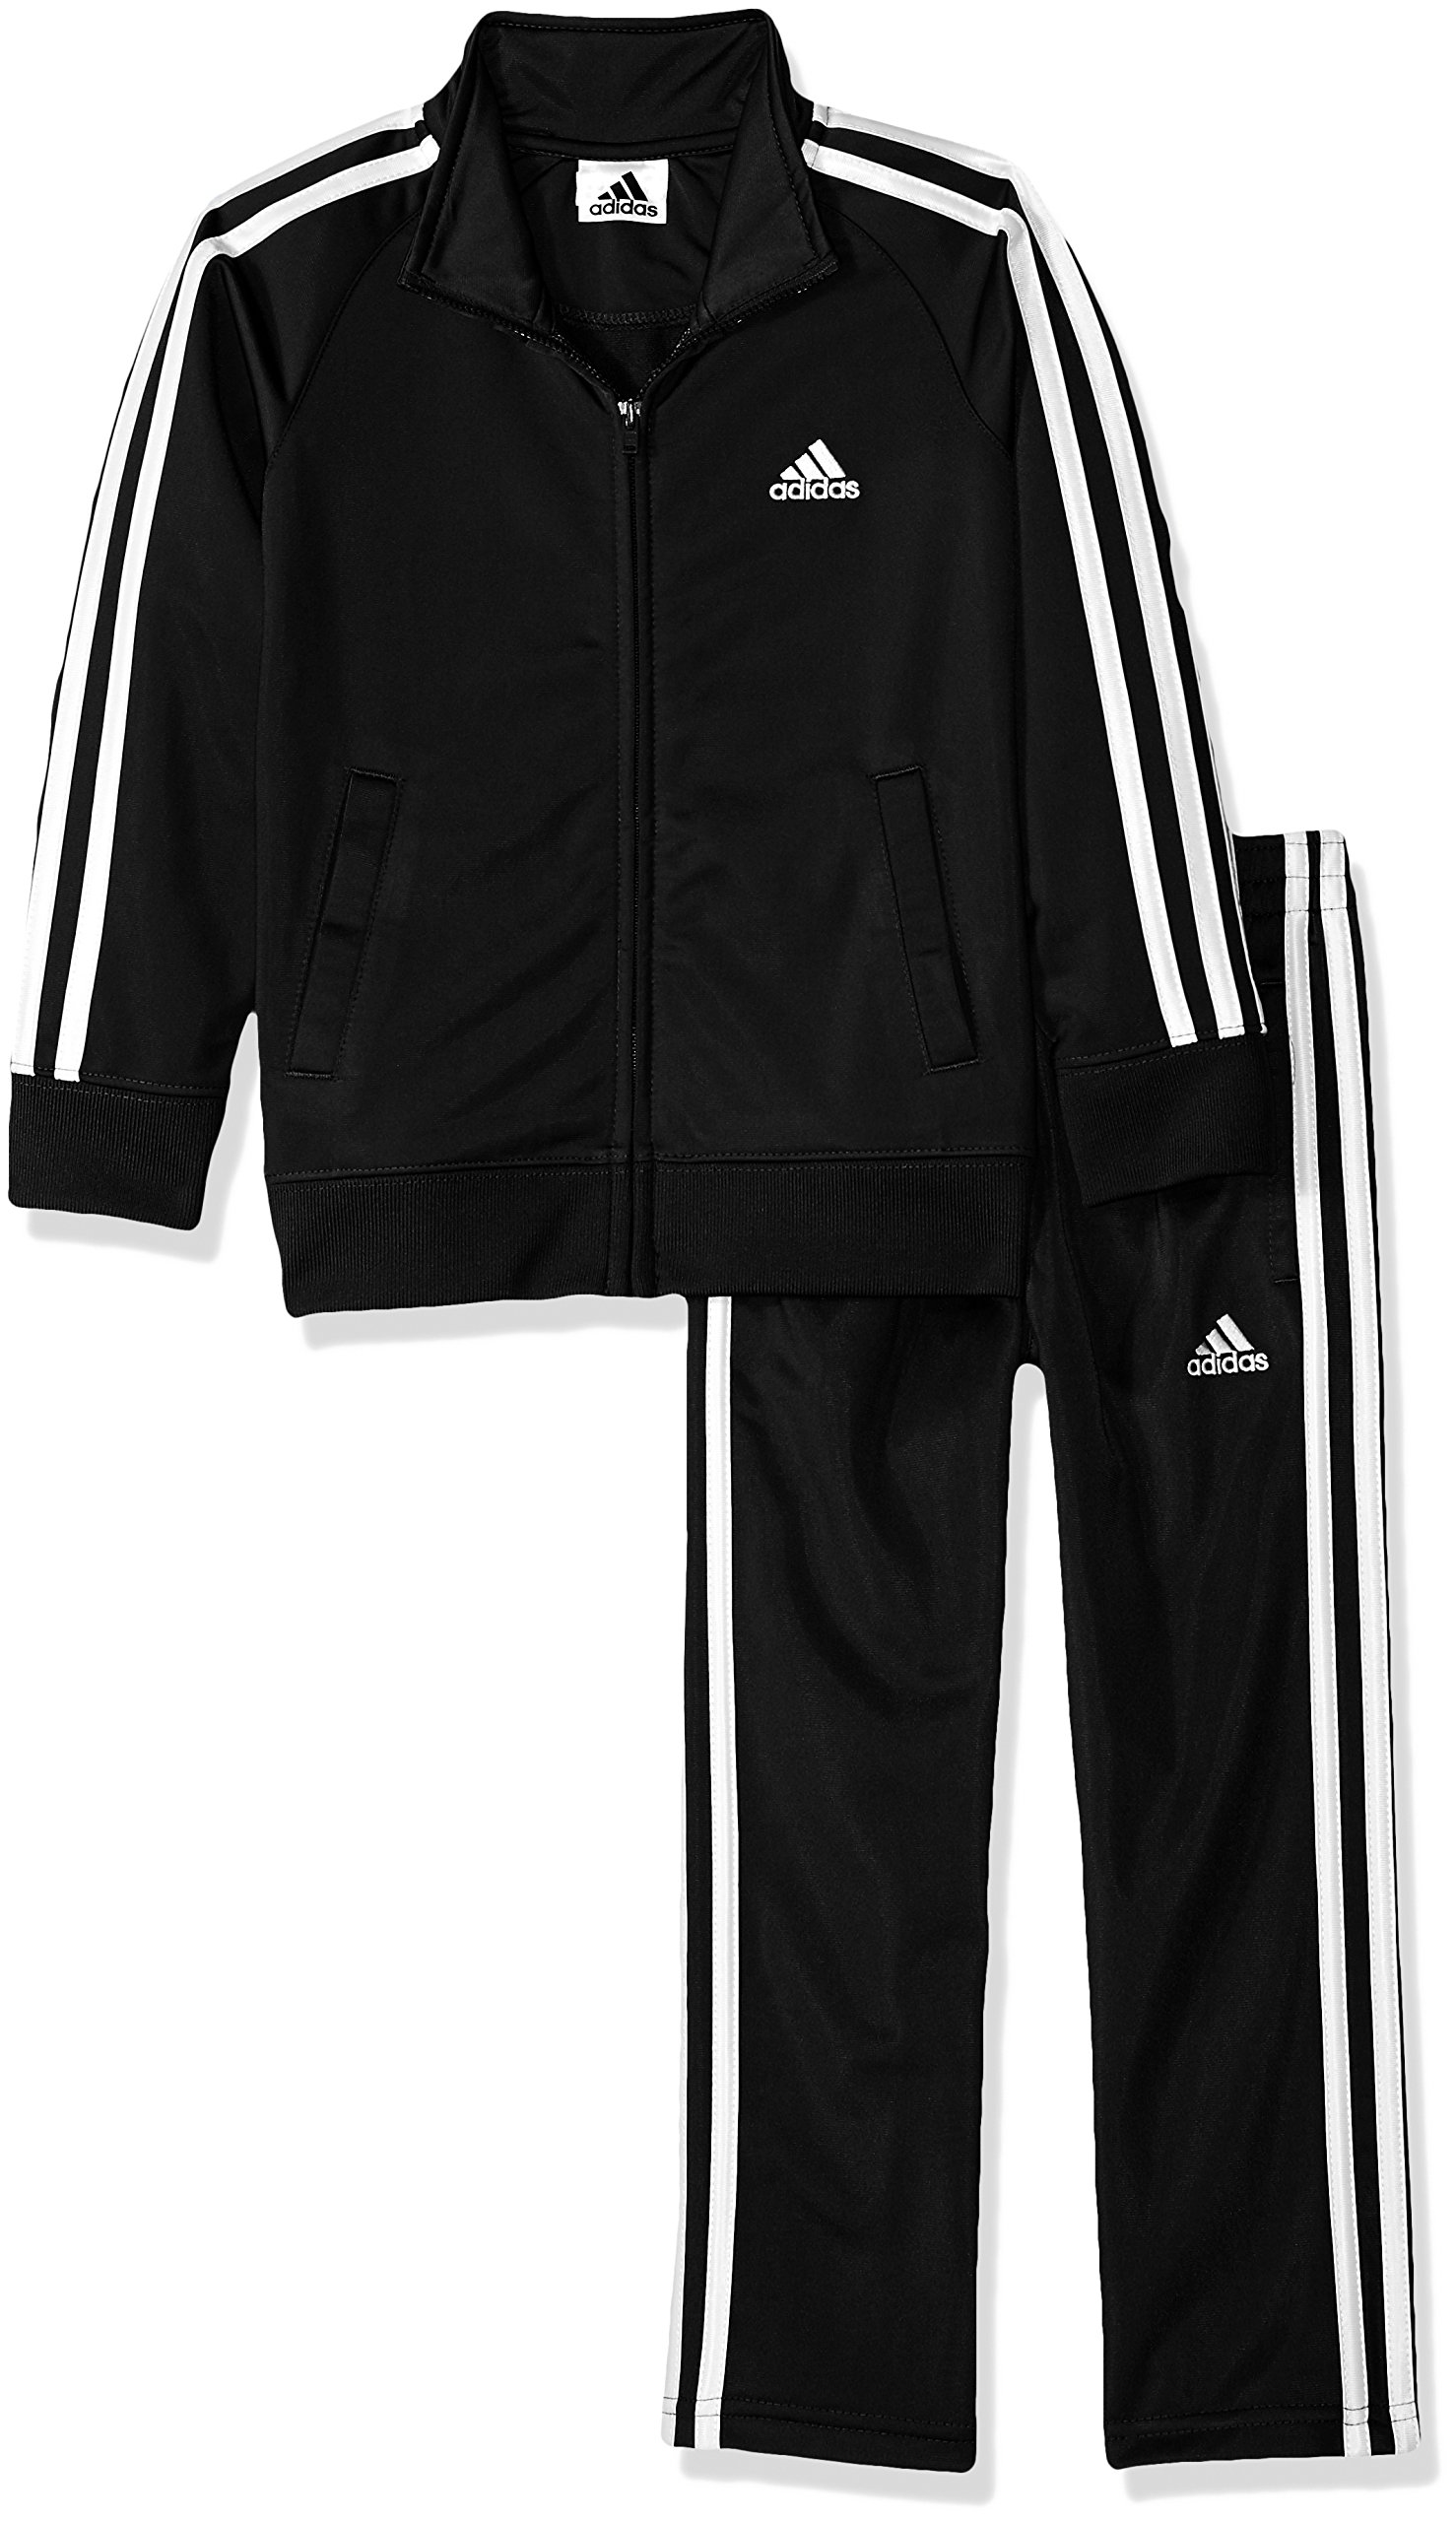 adidas Boys' Toddler Tricot Jacket and Pant Set, Midnight Adi, 3T